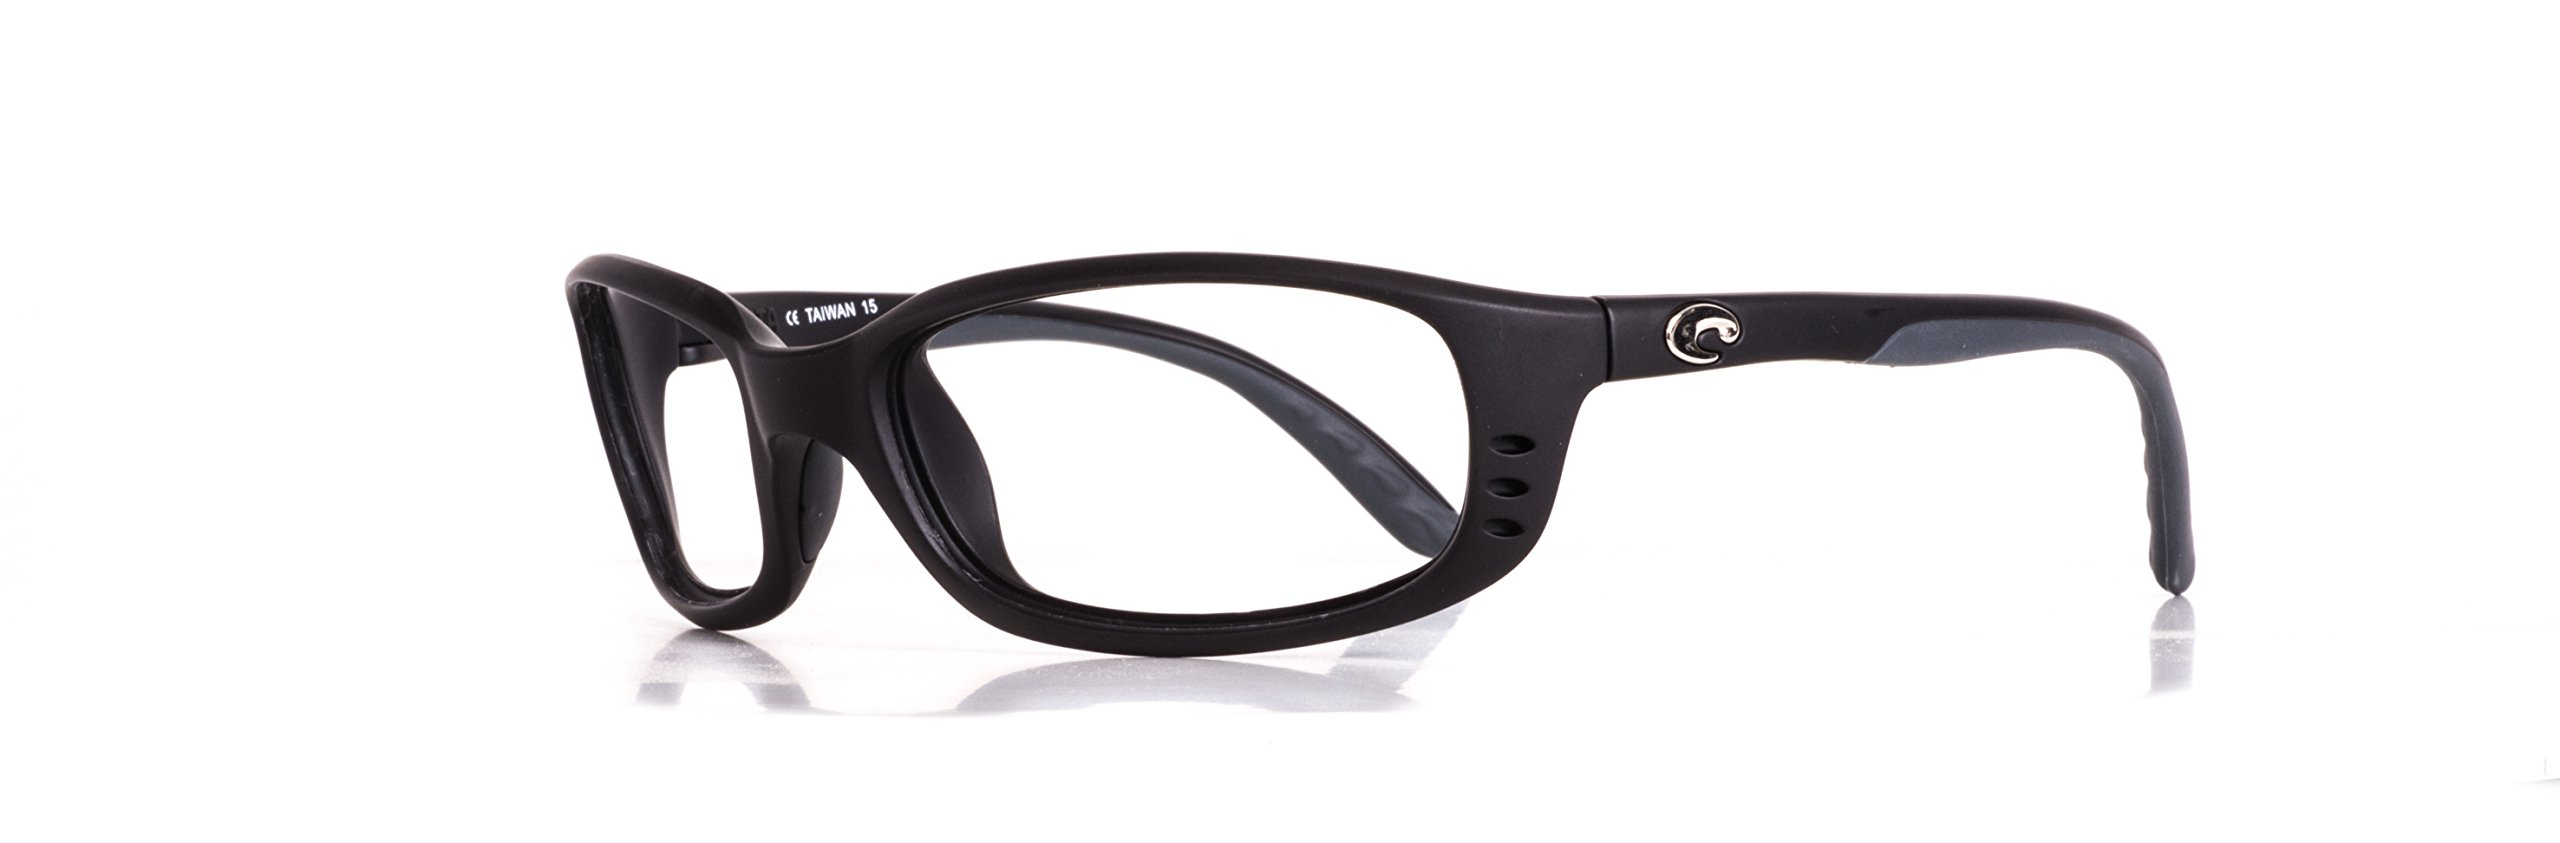 Costa del Mar Brine Black Radiation Glasses - Leaded Protective Eyewear